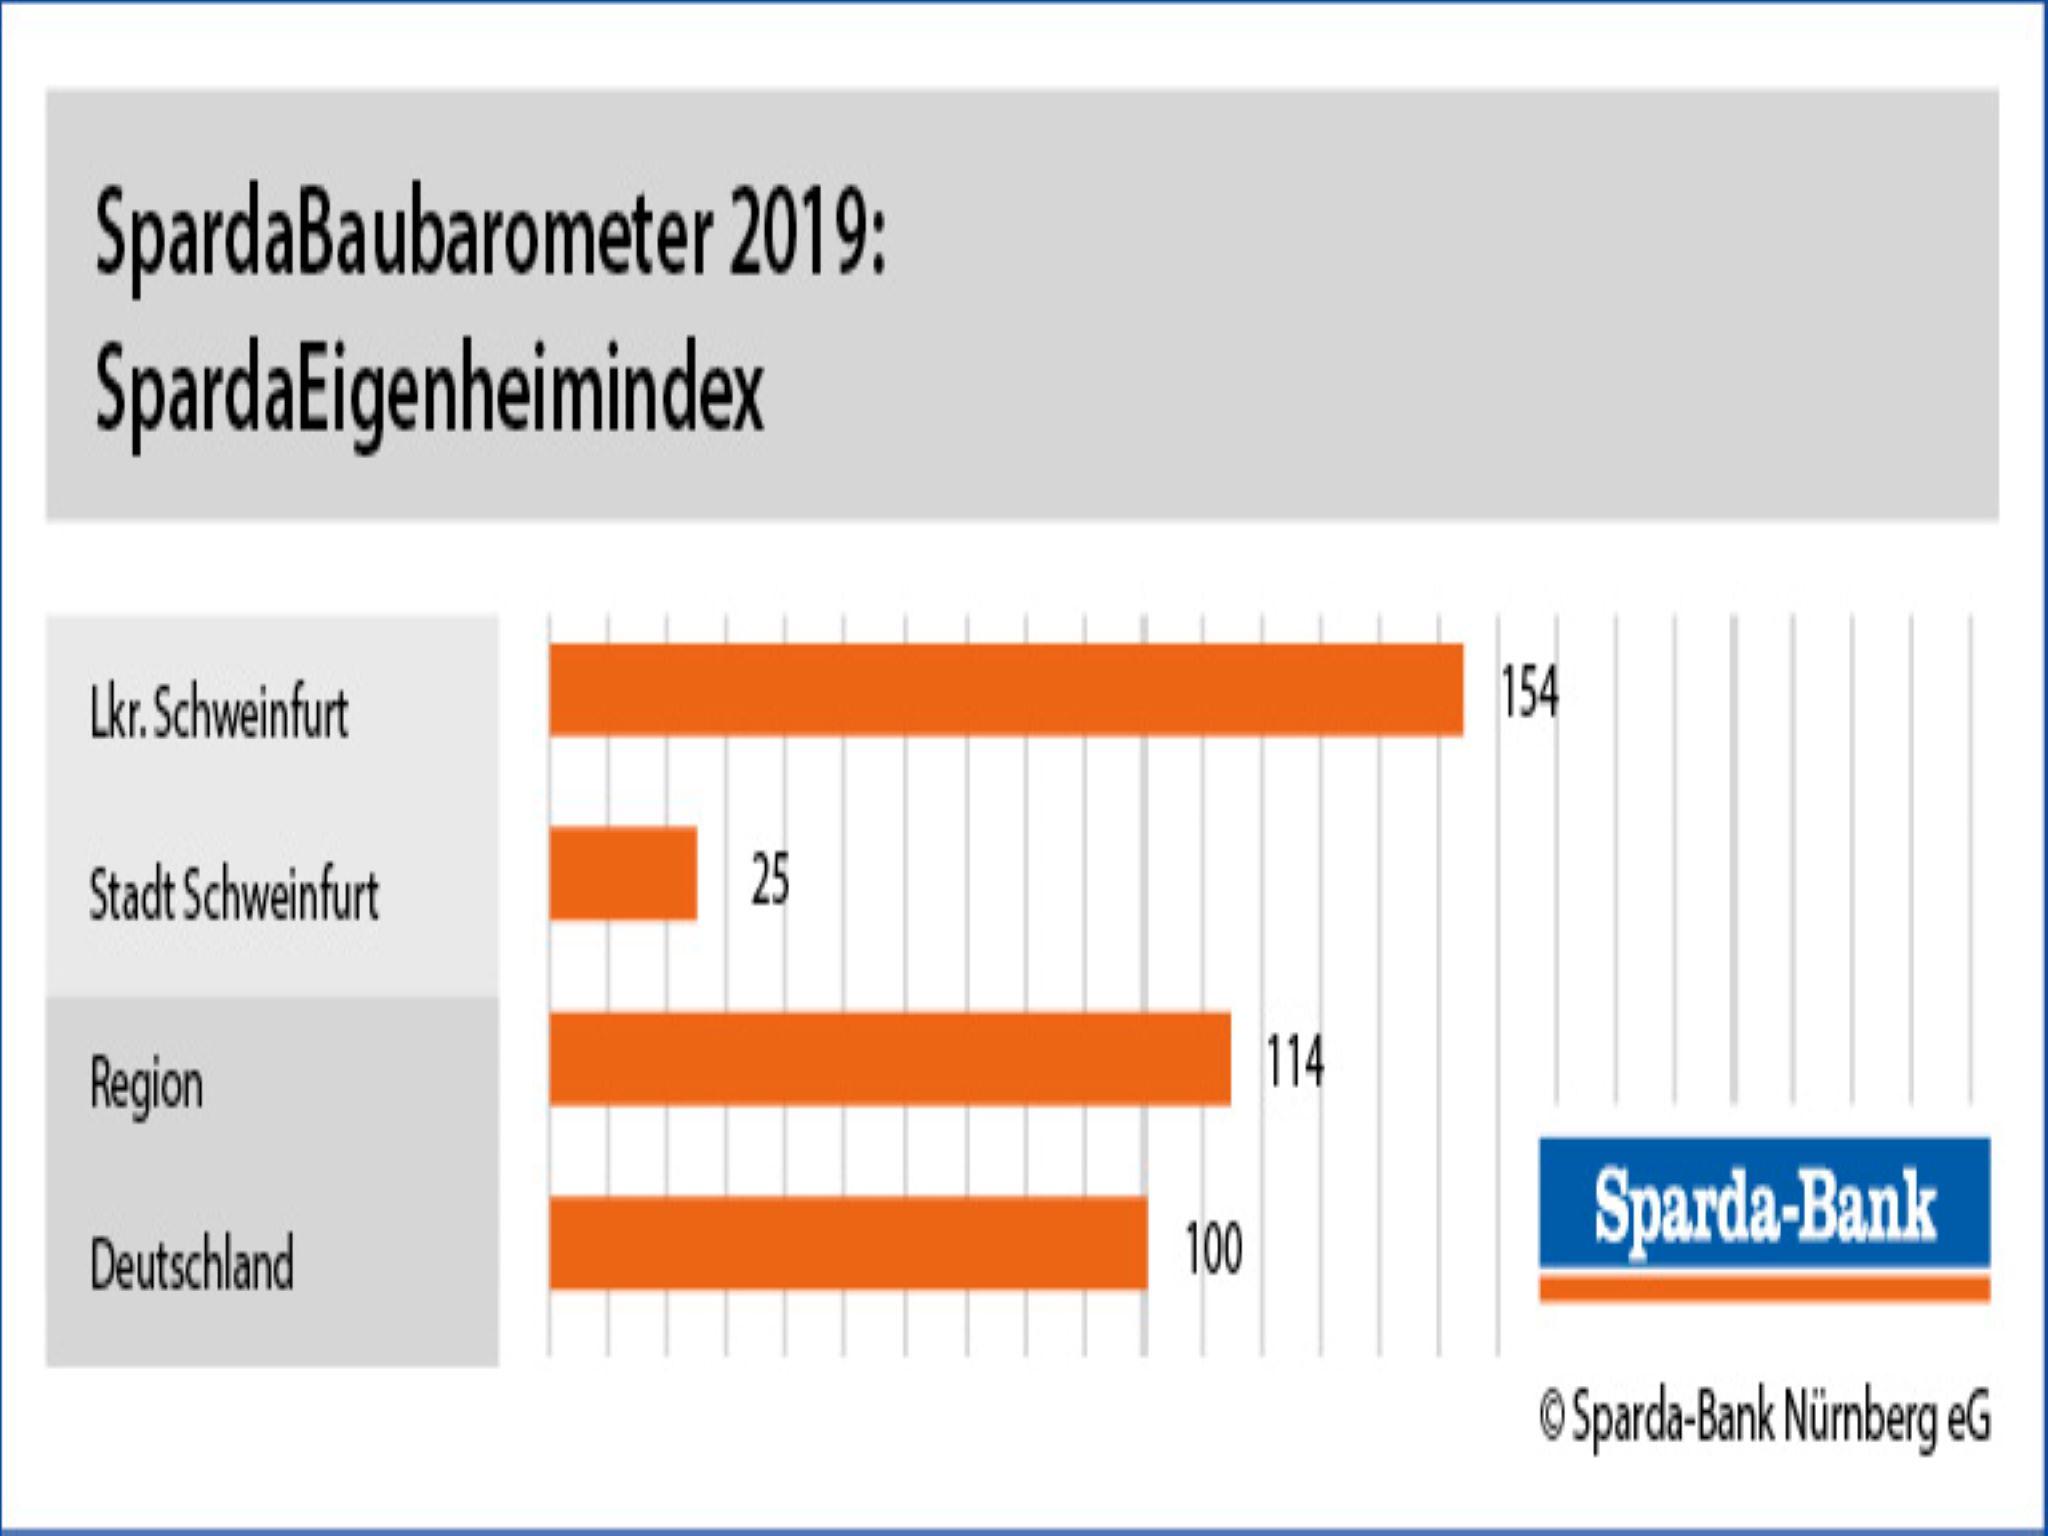 Eigenheimindex Stadt & Landkreis Schweinfurt; Grafik: Sparda-Bank Nürnberg